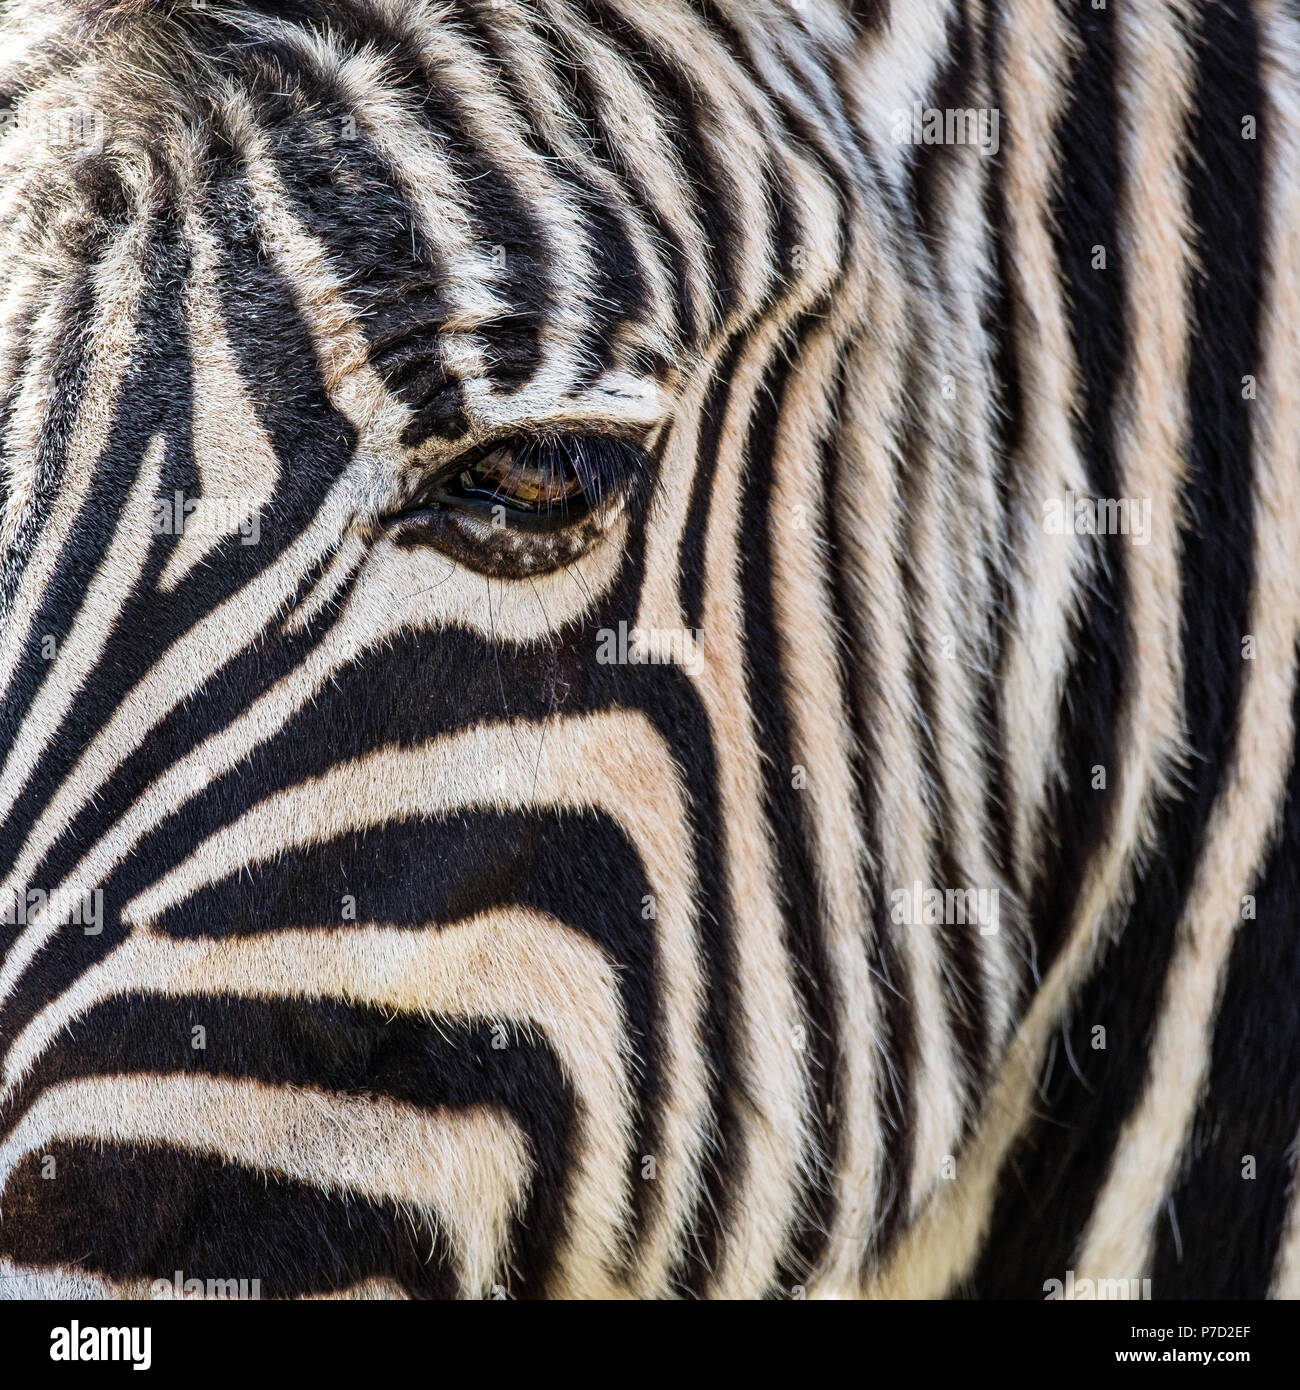 Nahaufnahme von einem Zebra Horse Eye Stockfoto